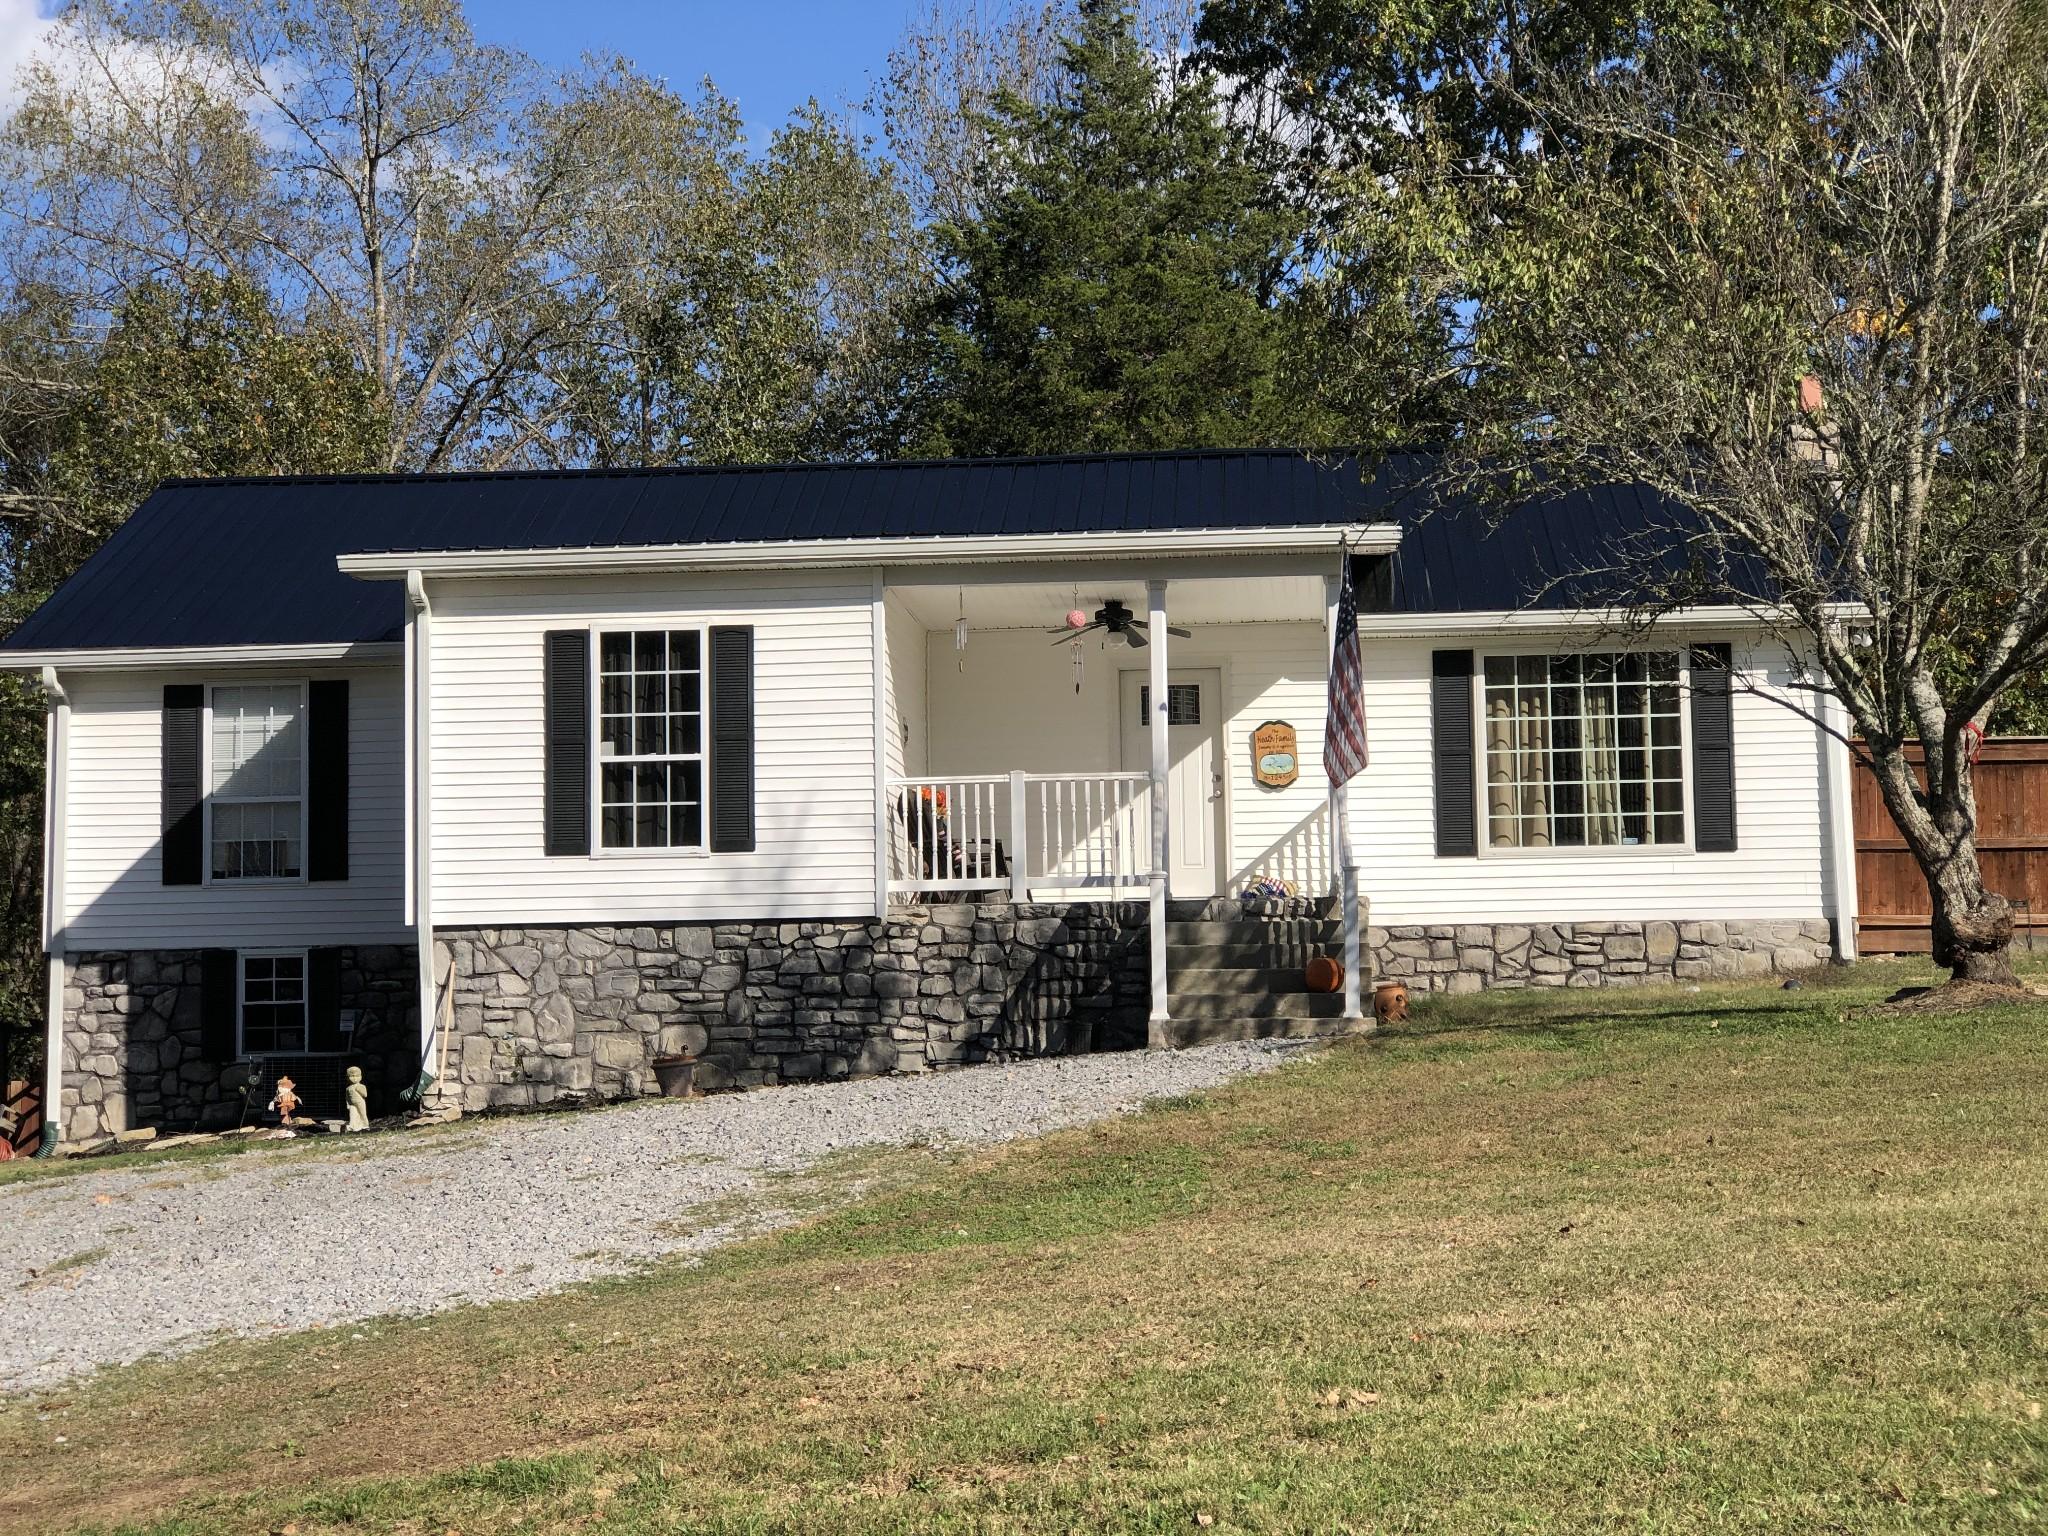 1245 Sams Creek Rd, Ashland City, TN 37015 - Ashland City, TN real estate listing